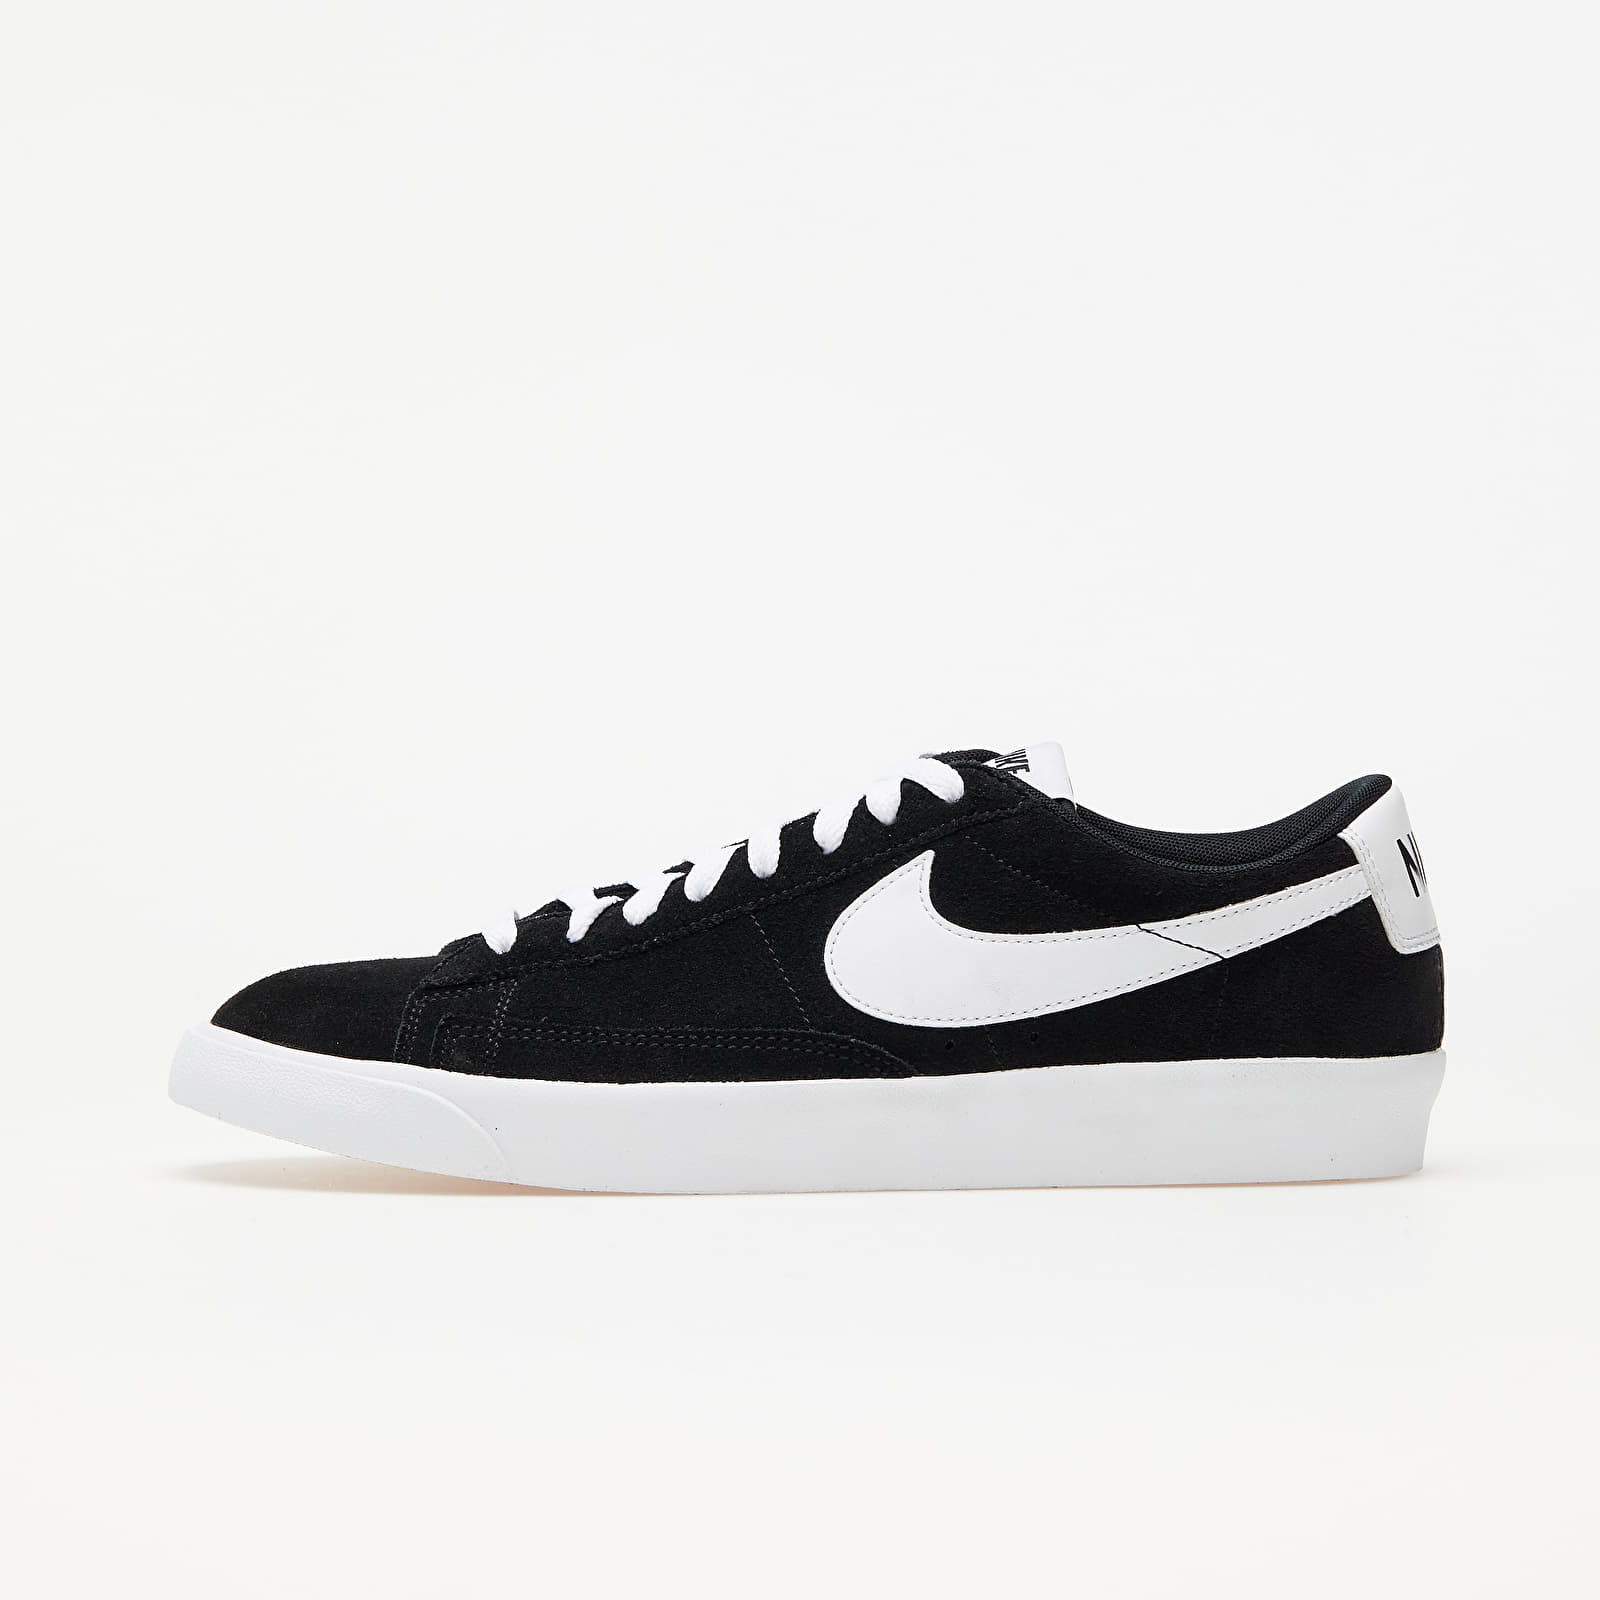 Nike Blazer Low Premium Vntg Suede Black/ White EUR 41